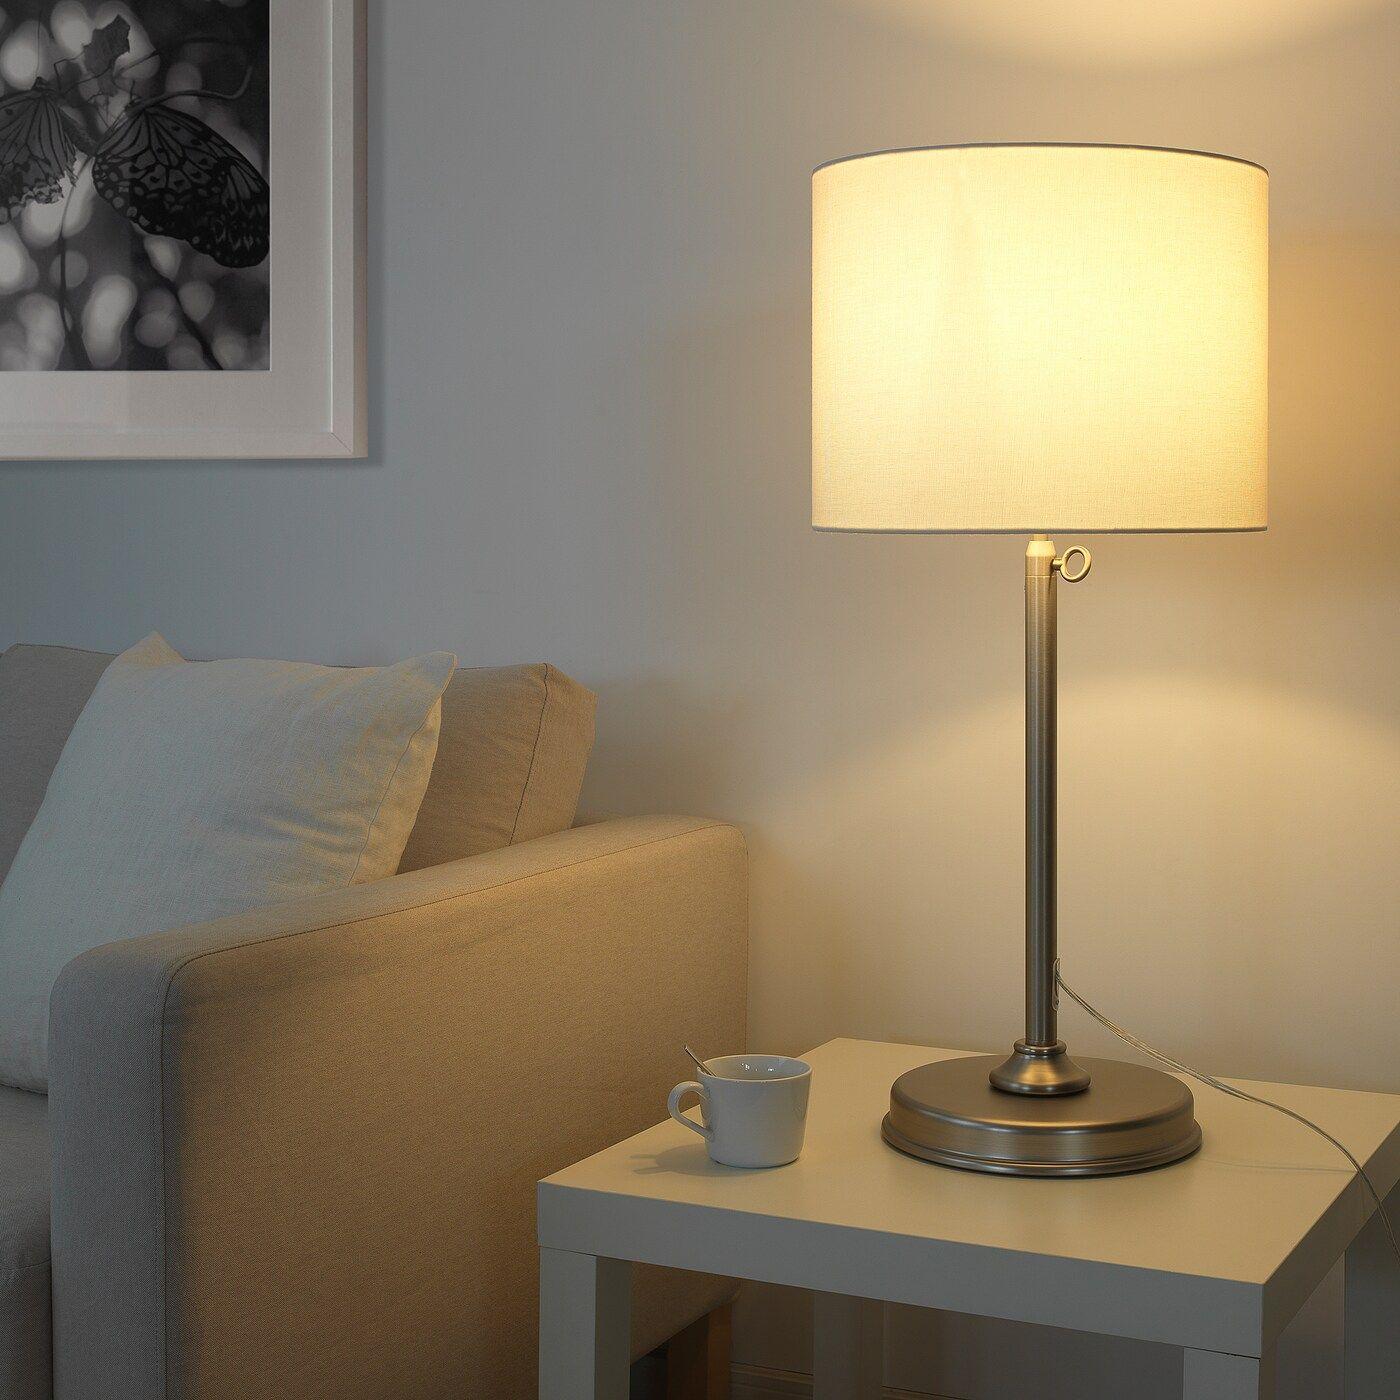 Ikea Milleryr Table Lamp In 2020 Table Lamp White Table Lamp Lamp